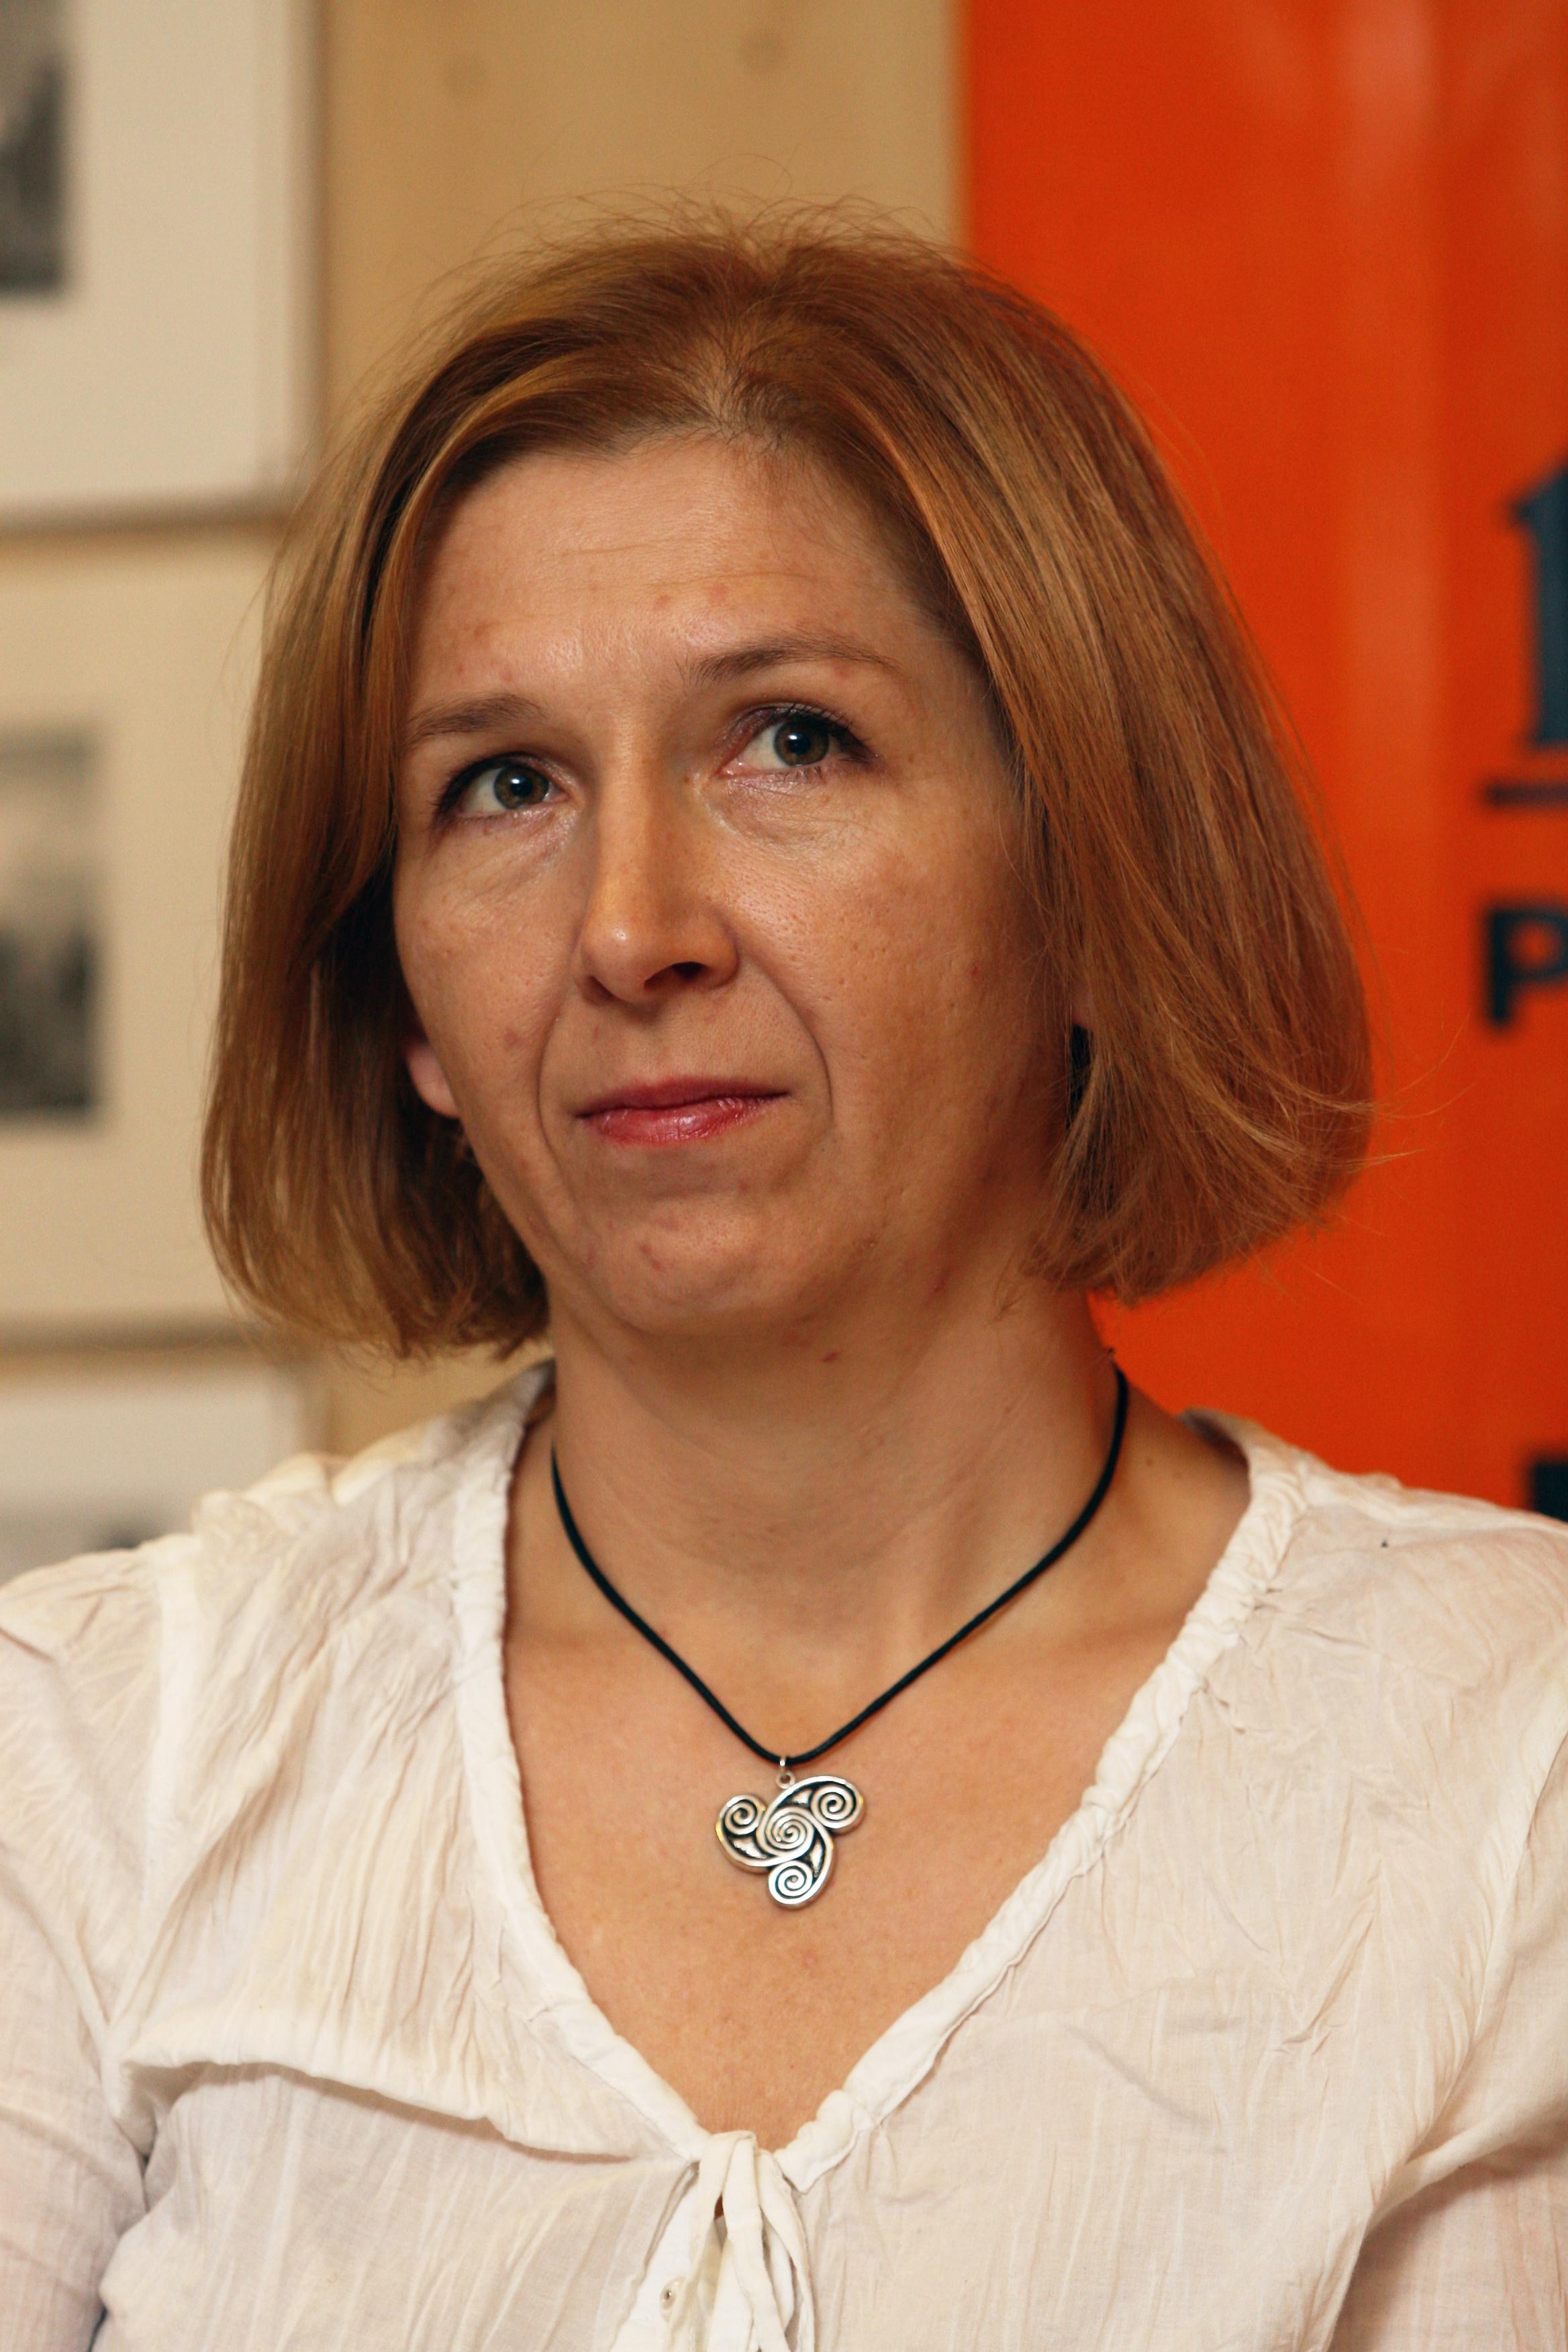 Lucie Lomová (2008)